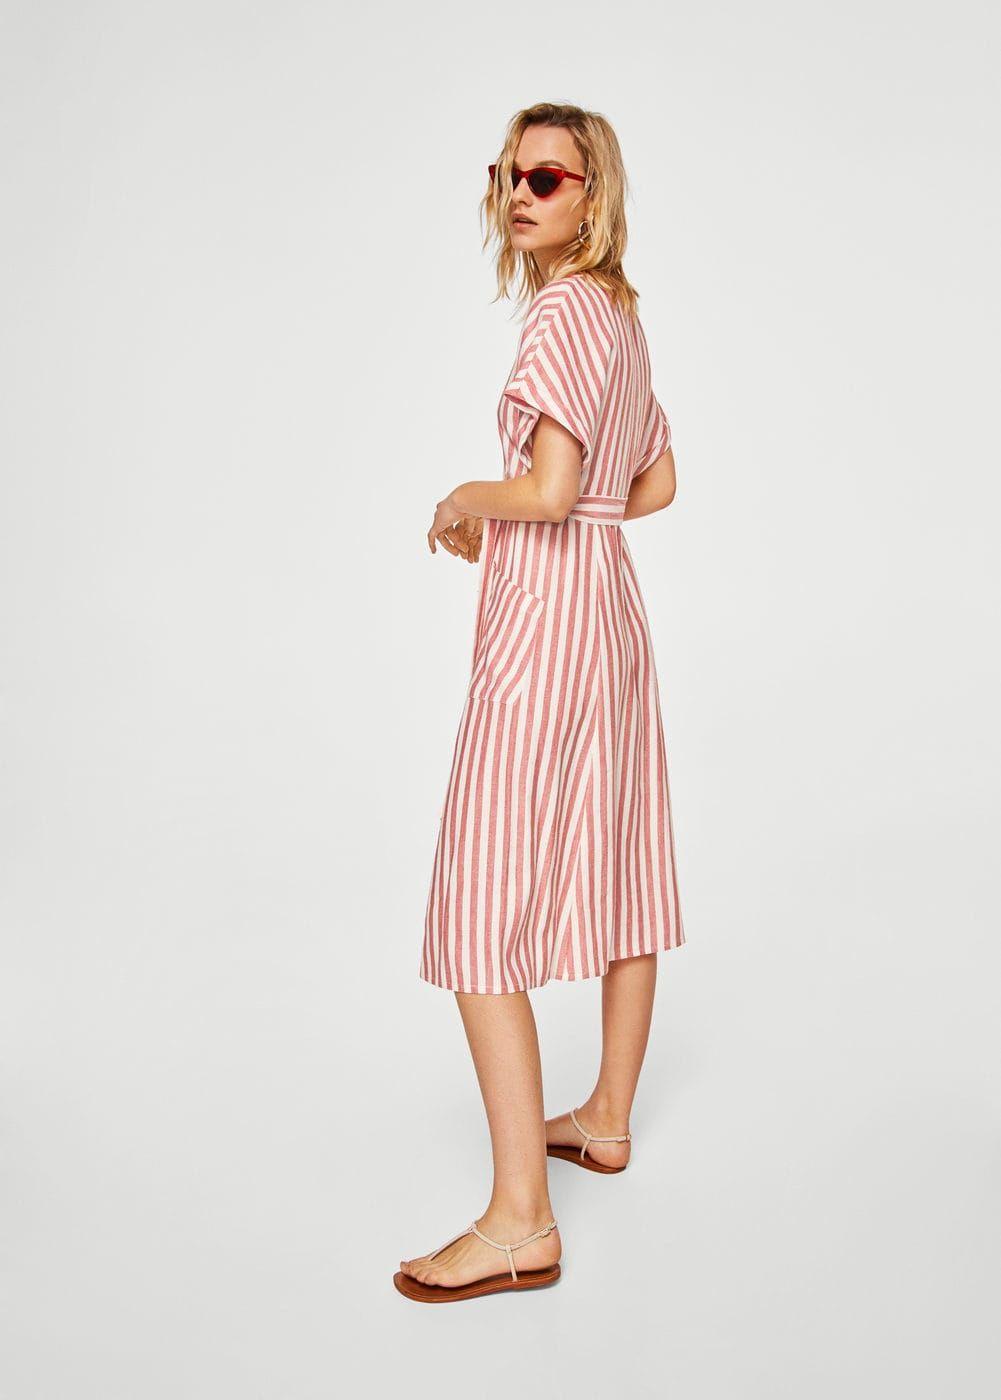 26dd538524 Vestido algodón rayas - Mujer en 2019